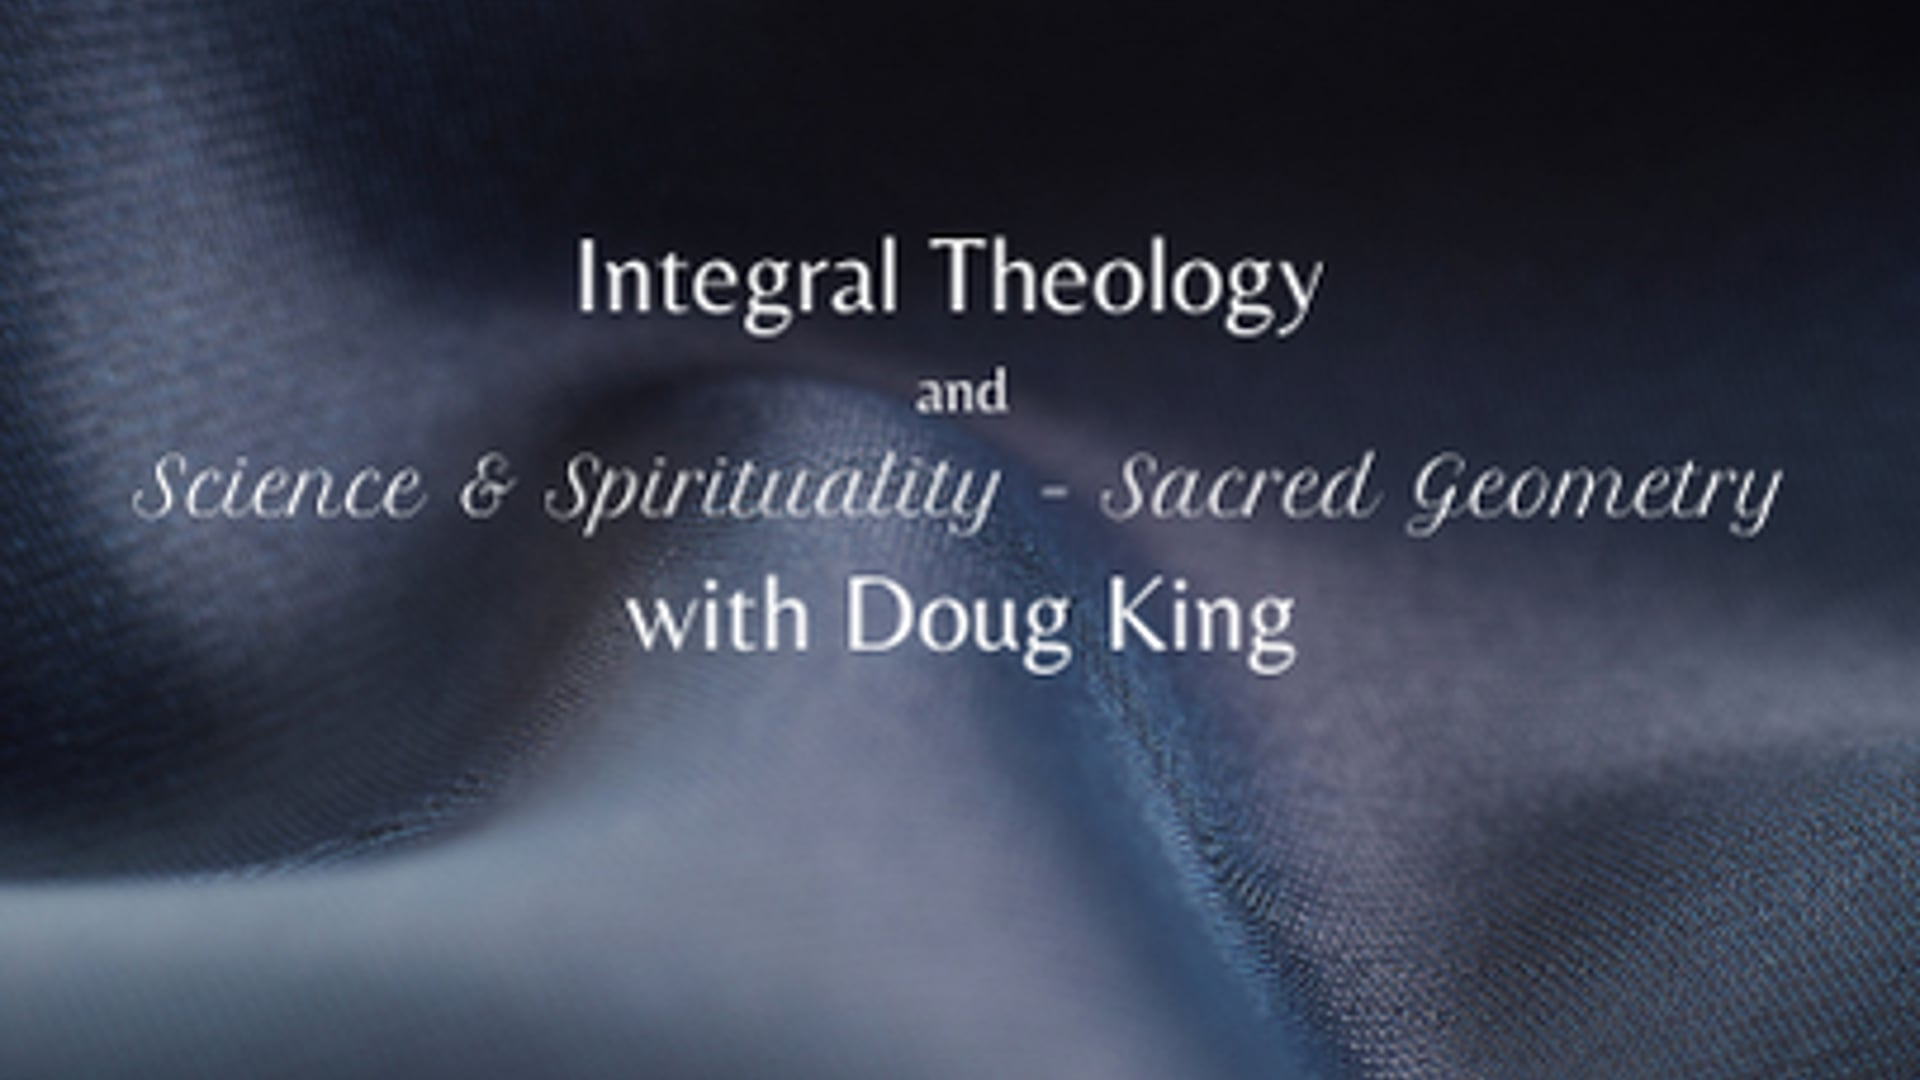 Science & Spirituality-Sacred Geometry